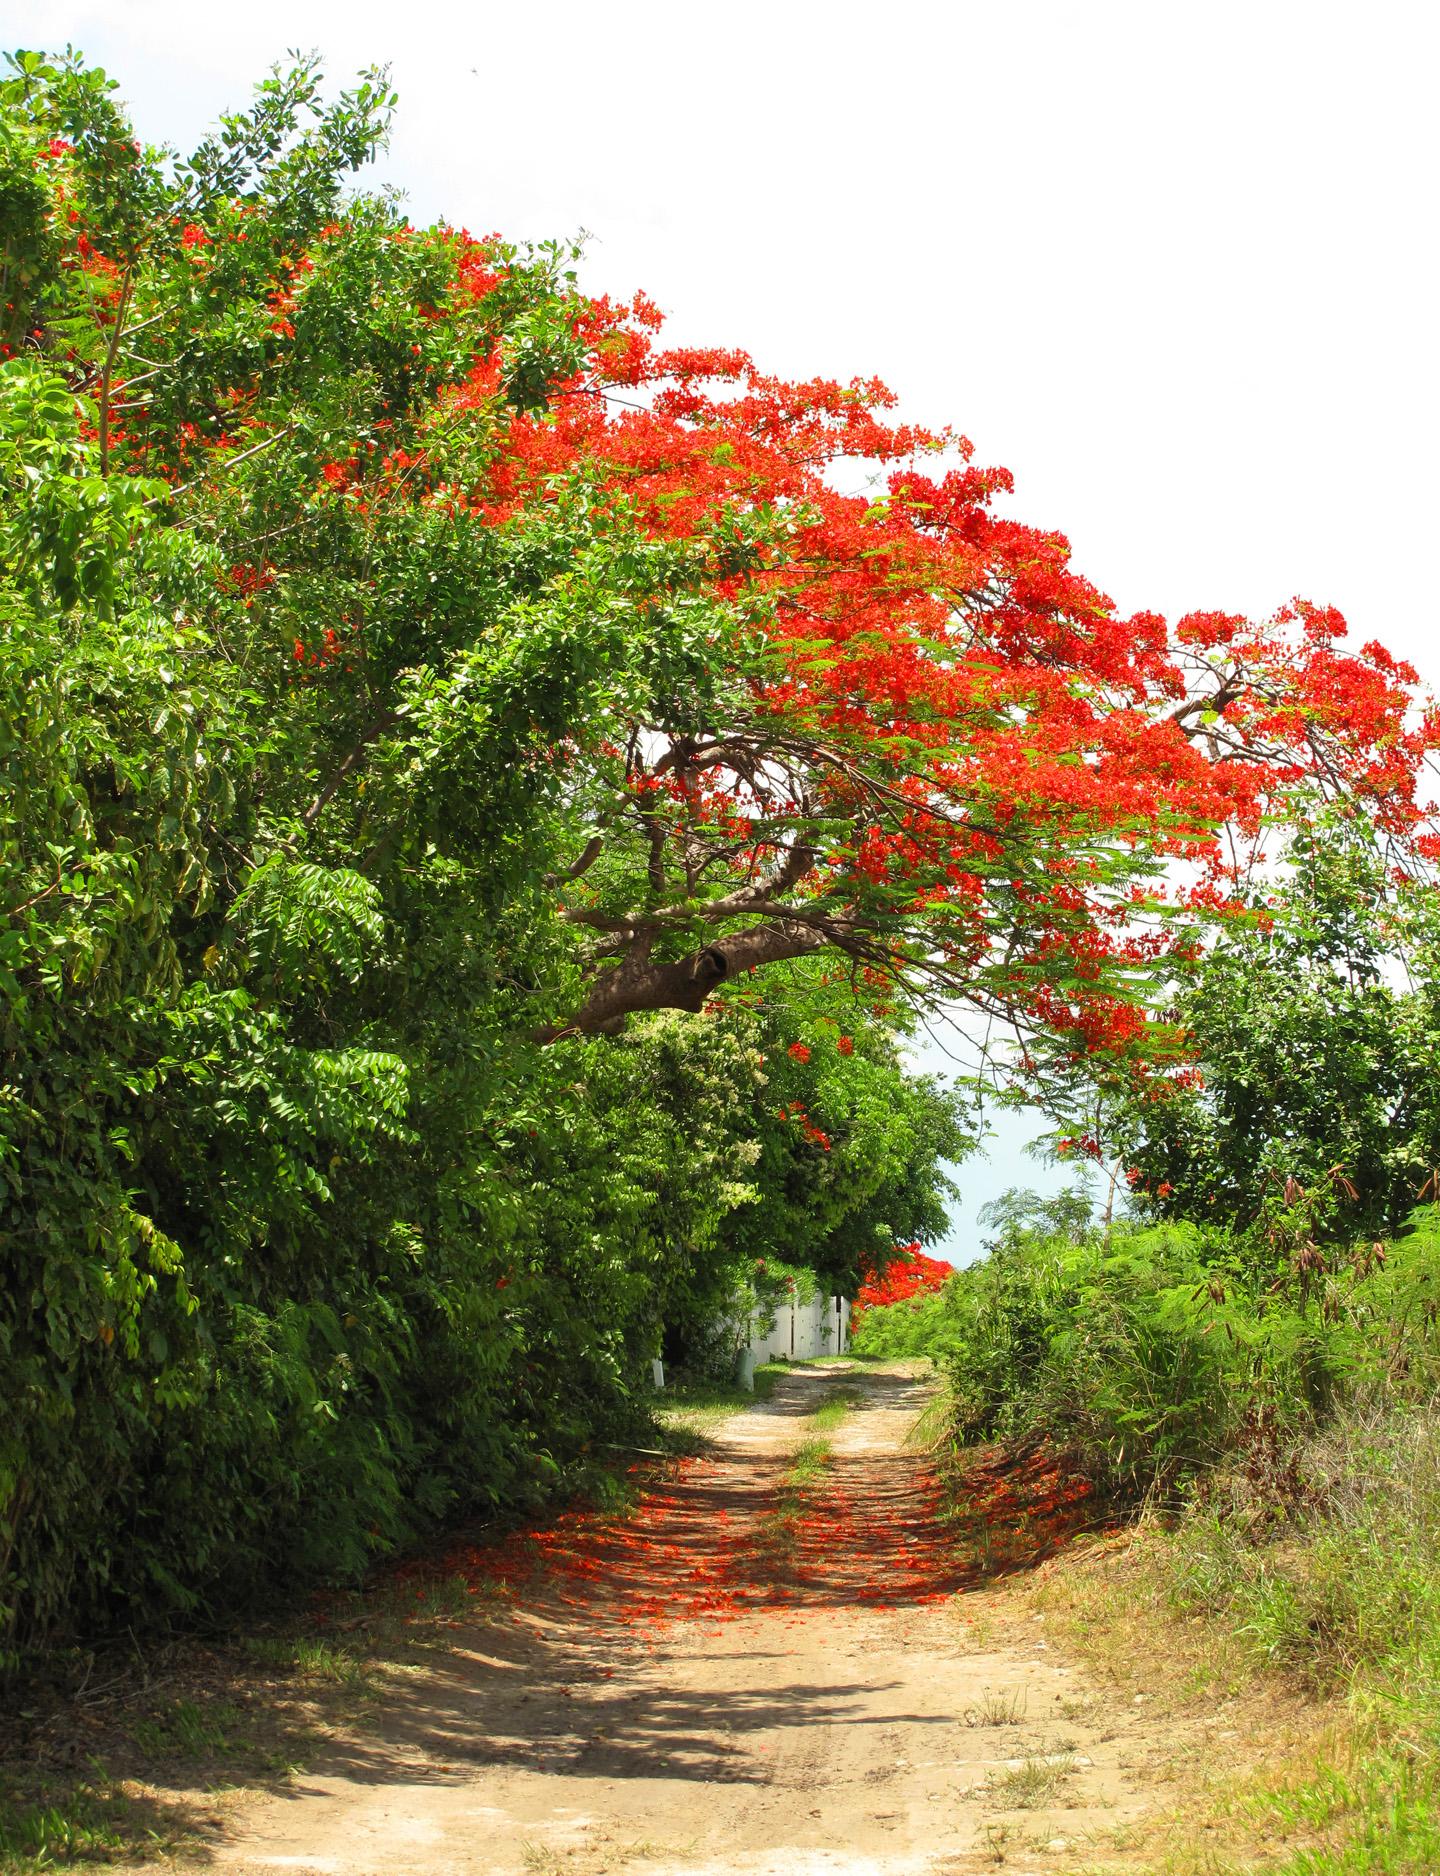 bahamas, abaco, green turtle cay, bougainvillea